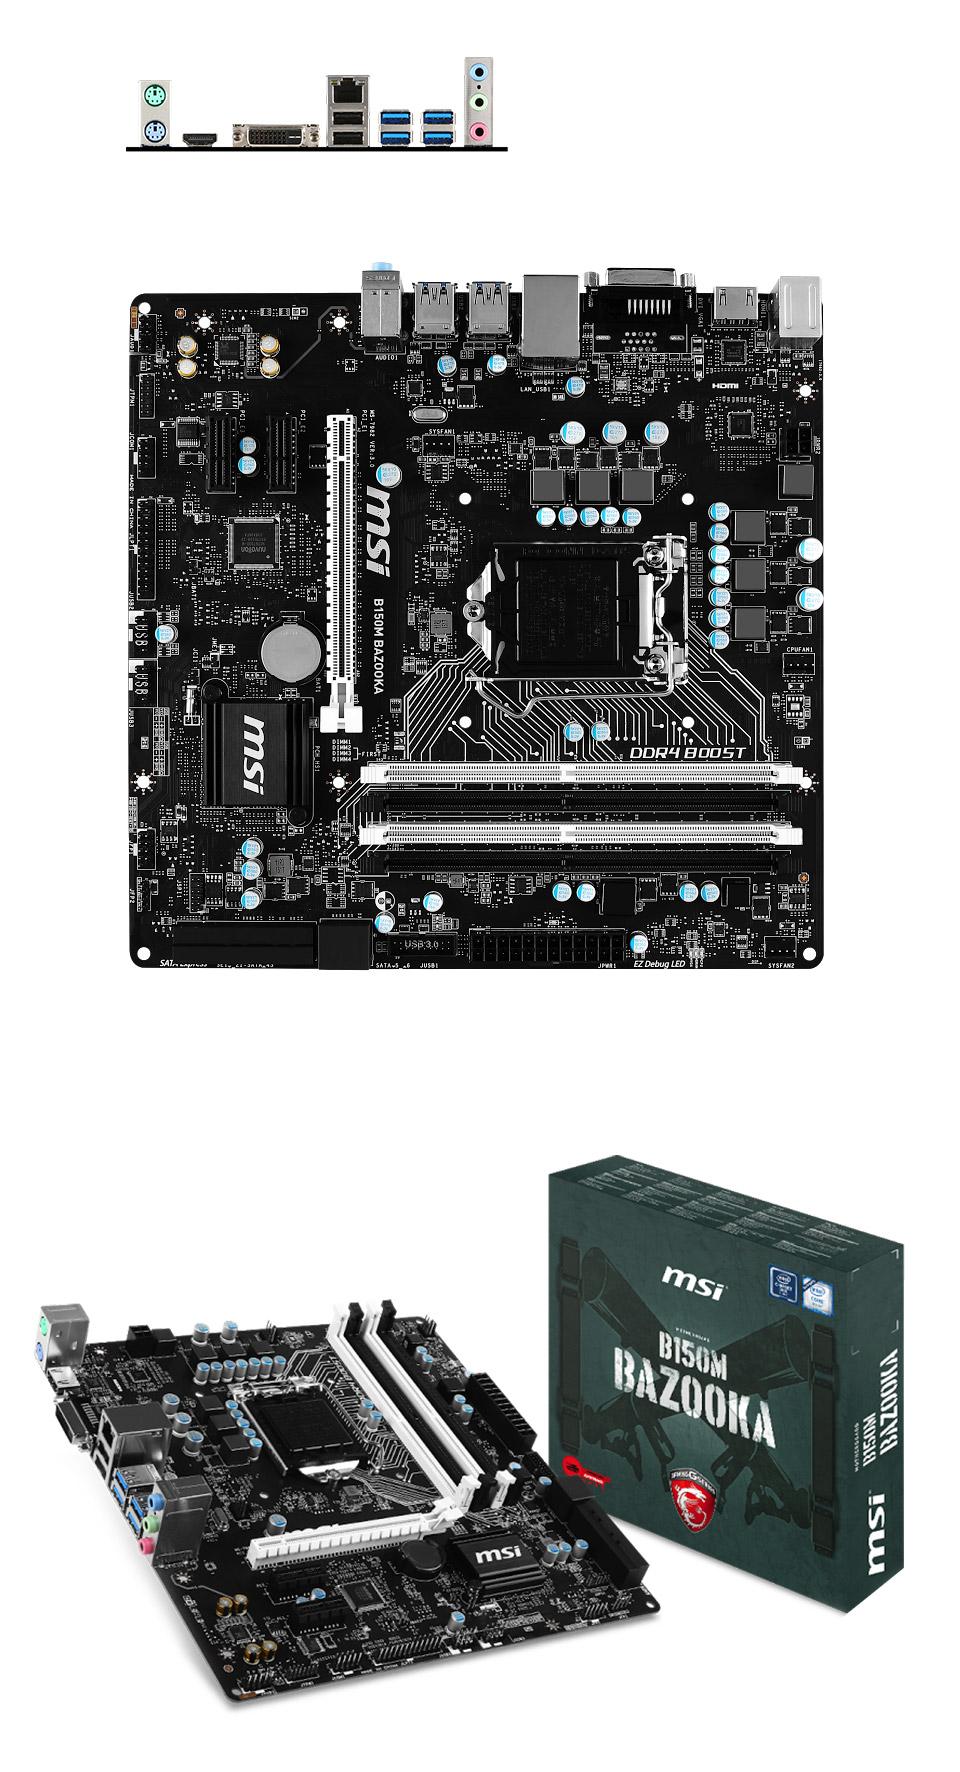 MSI B150M Bazooka Motherboard [B150M-BAZOOKA] : PC Case Gear